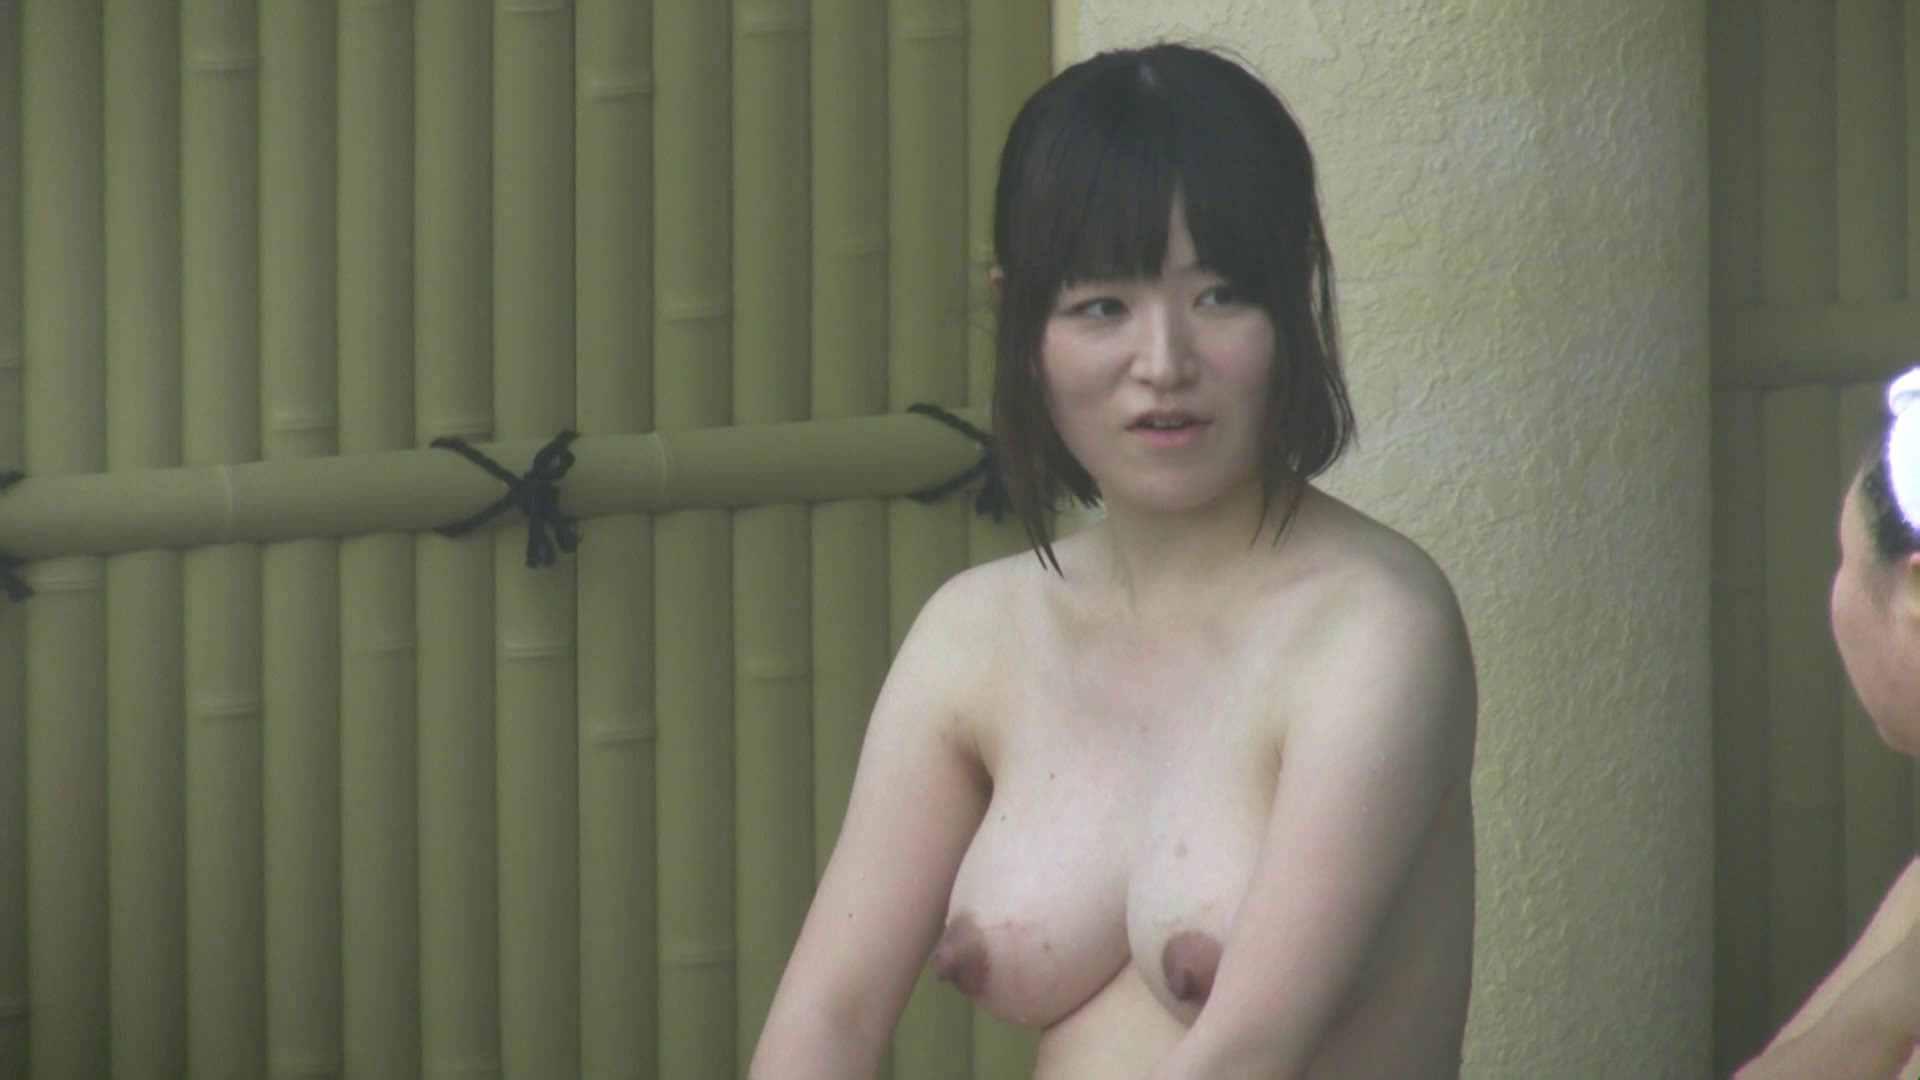 Aquaな露天風呂Vol.606 露天 スケベ動画紹介 110枚 110